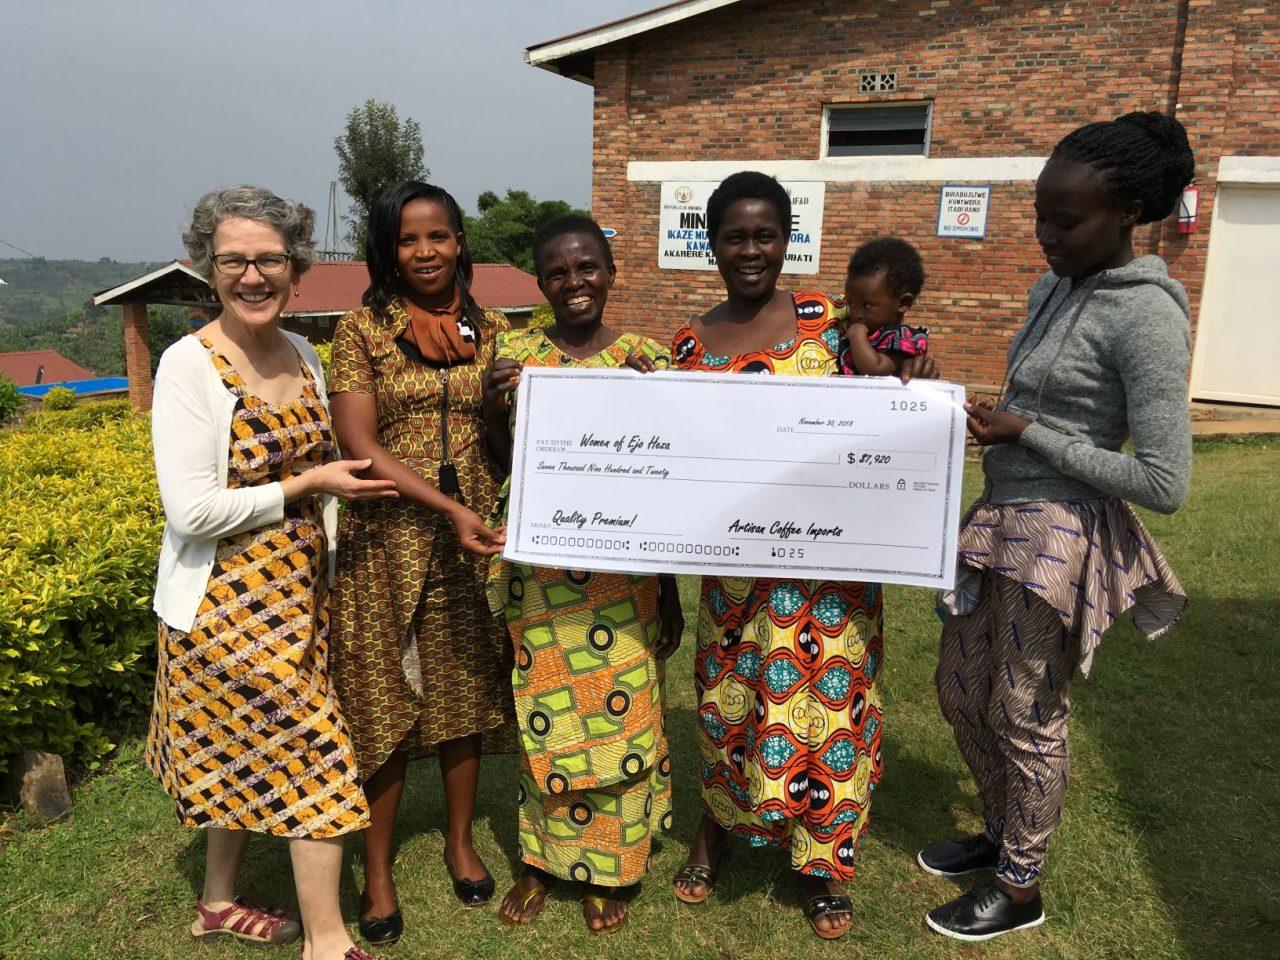 Ruth Ann Church presents a check to Ejo Heza